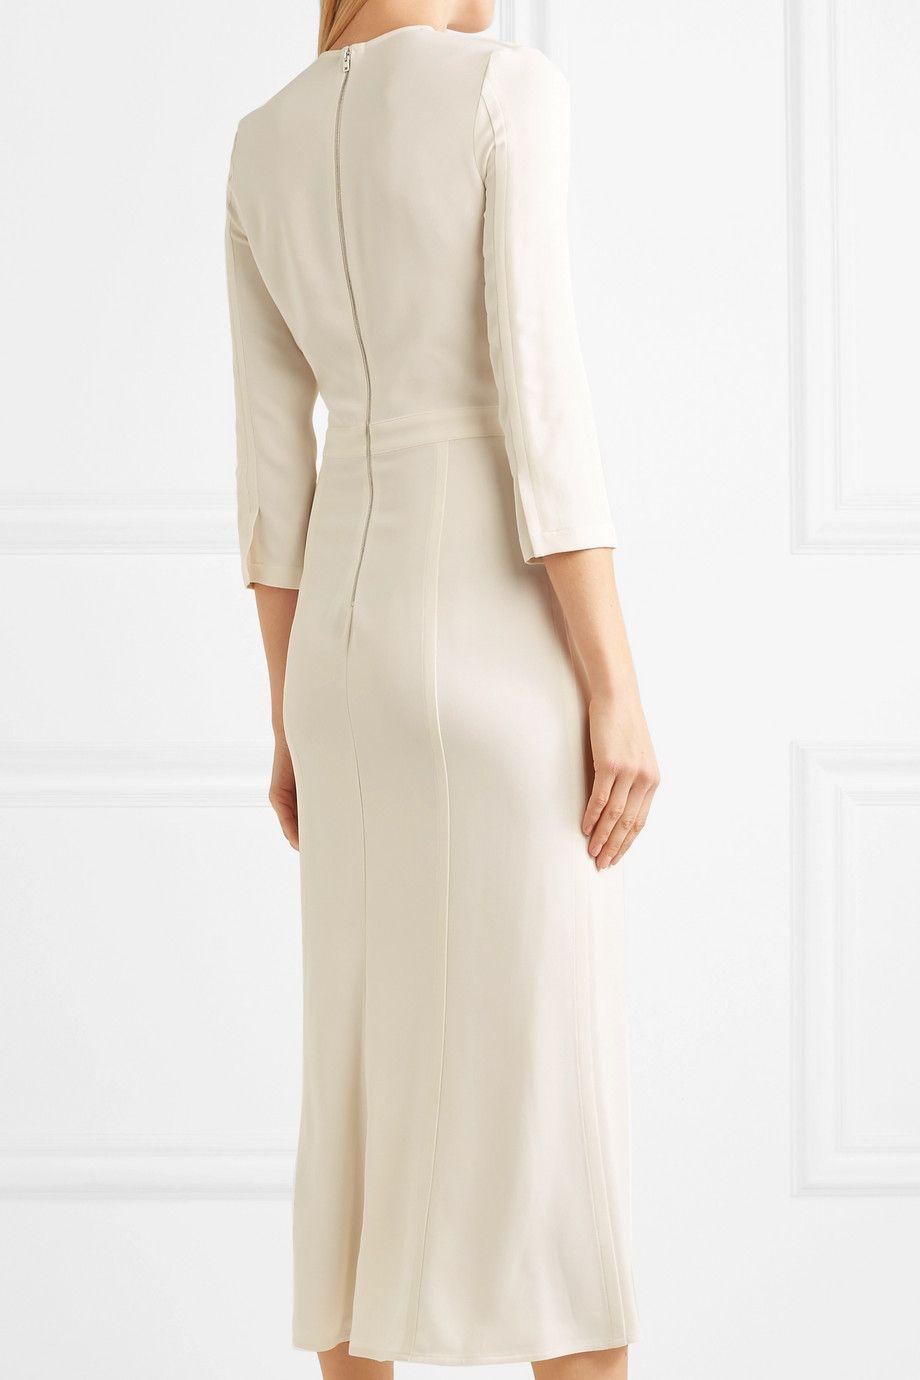 Victoria Beckham Paneled Cotton Jersey Midi Dress Net A Porter Com Victoria Dress Dresses Victoria Beckham [ 1380 x 920 Pixel ]